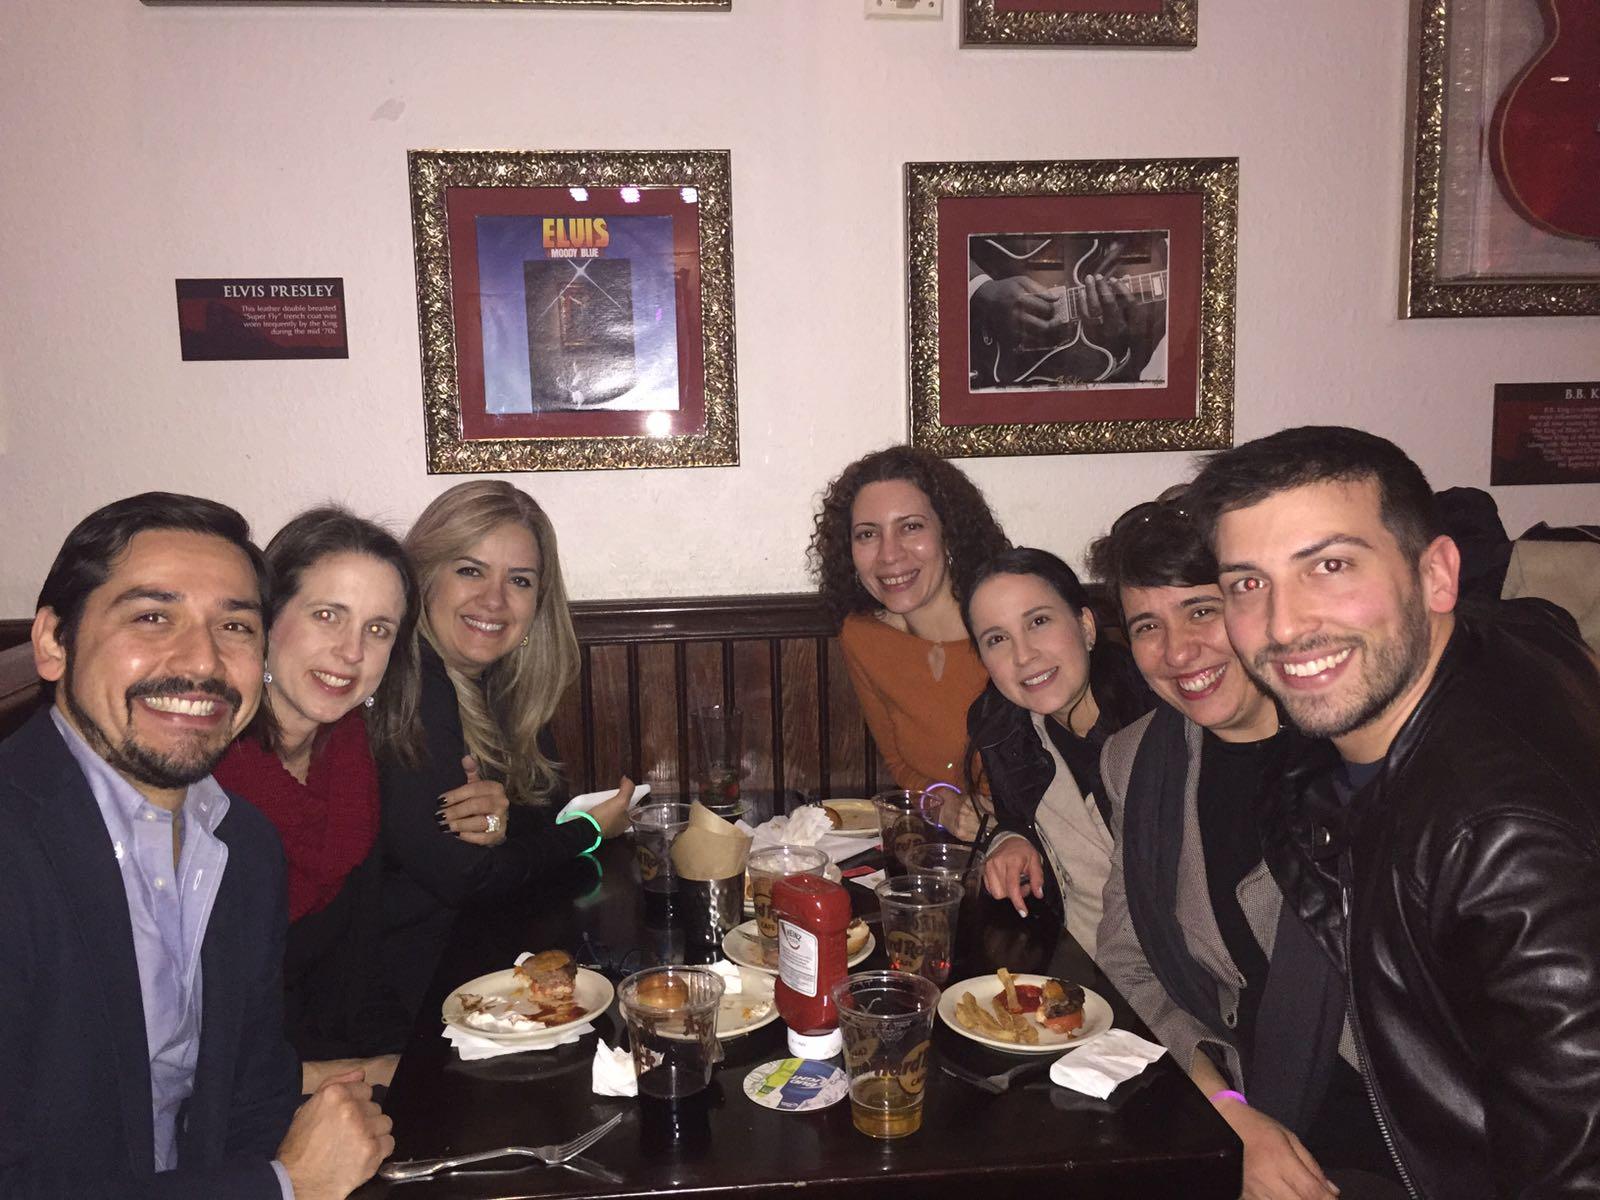 #ALAConf17 @ALABuzz International members from Panamá, DR, México & Brasil enjoying Denver's nightlife @GLAALABuzz. https://t.co/b2daH63CHA https://t.co/Yu2UikgCb3